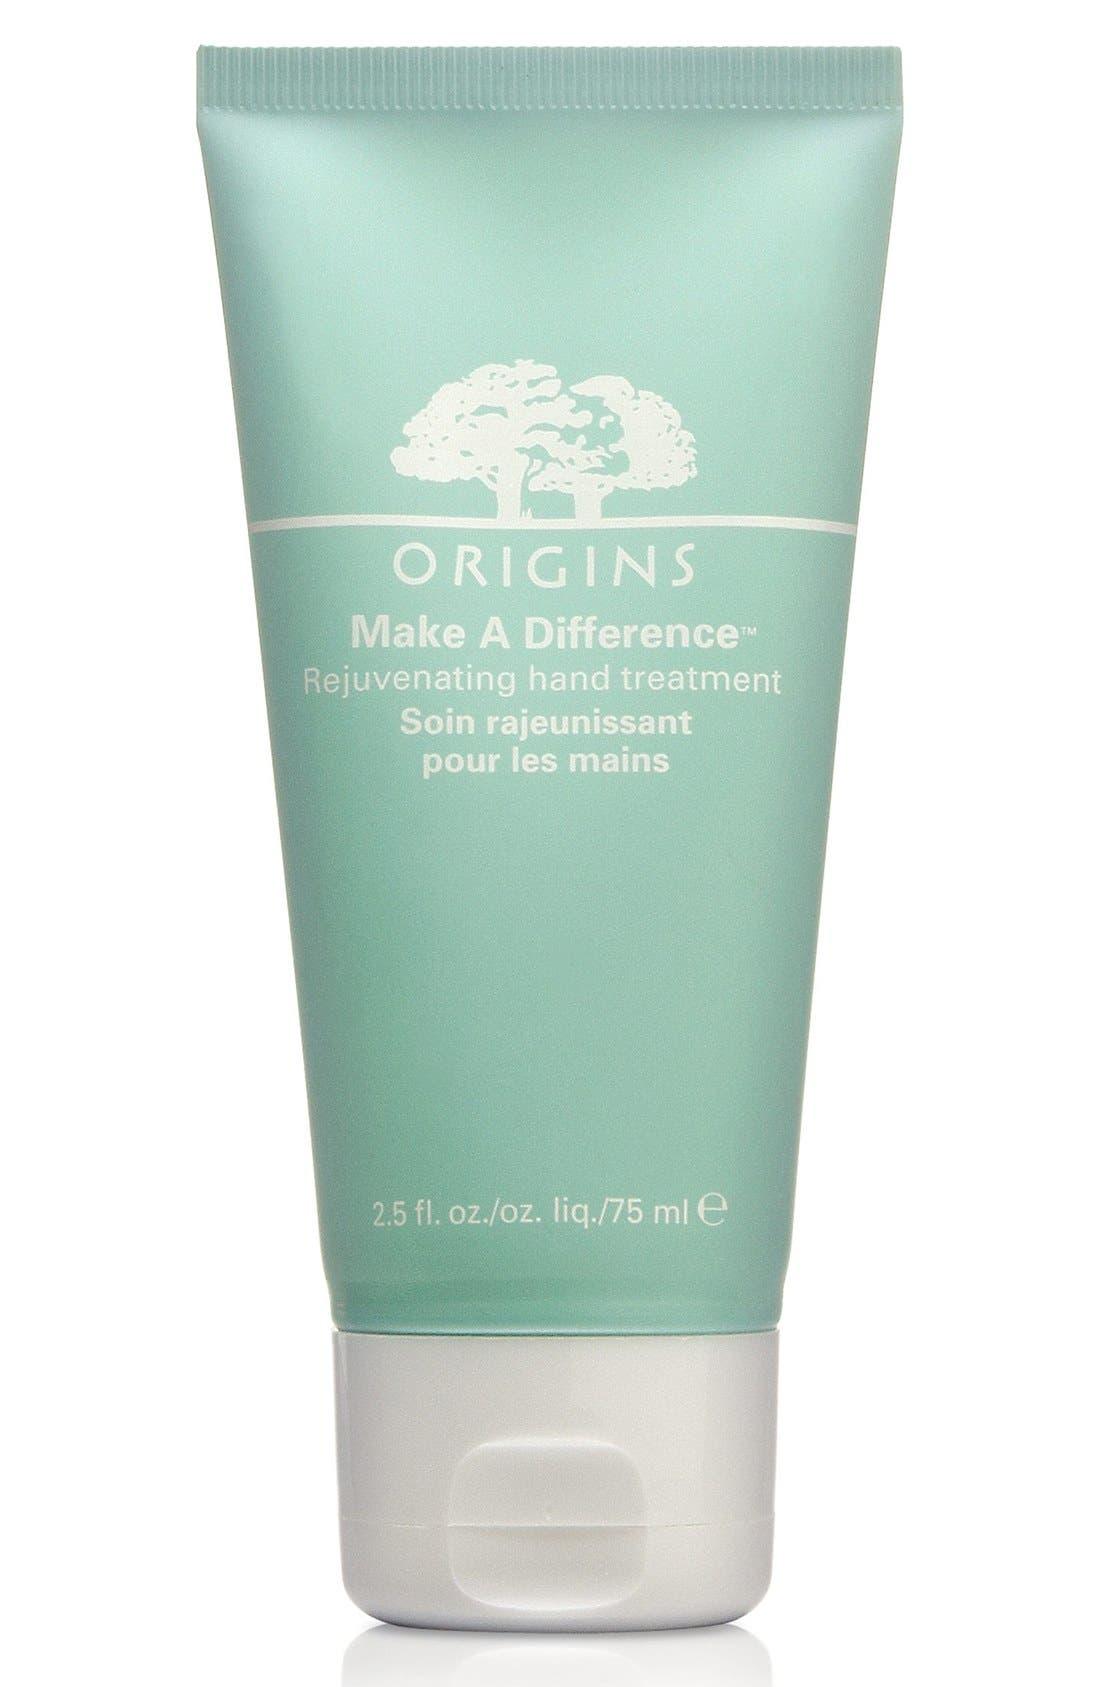 Origins Make A Difference™ Rejuvenating Hand Treatment